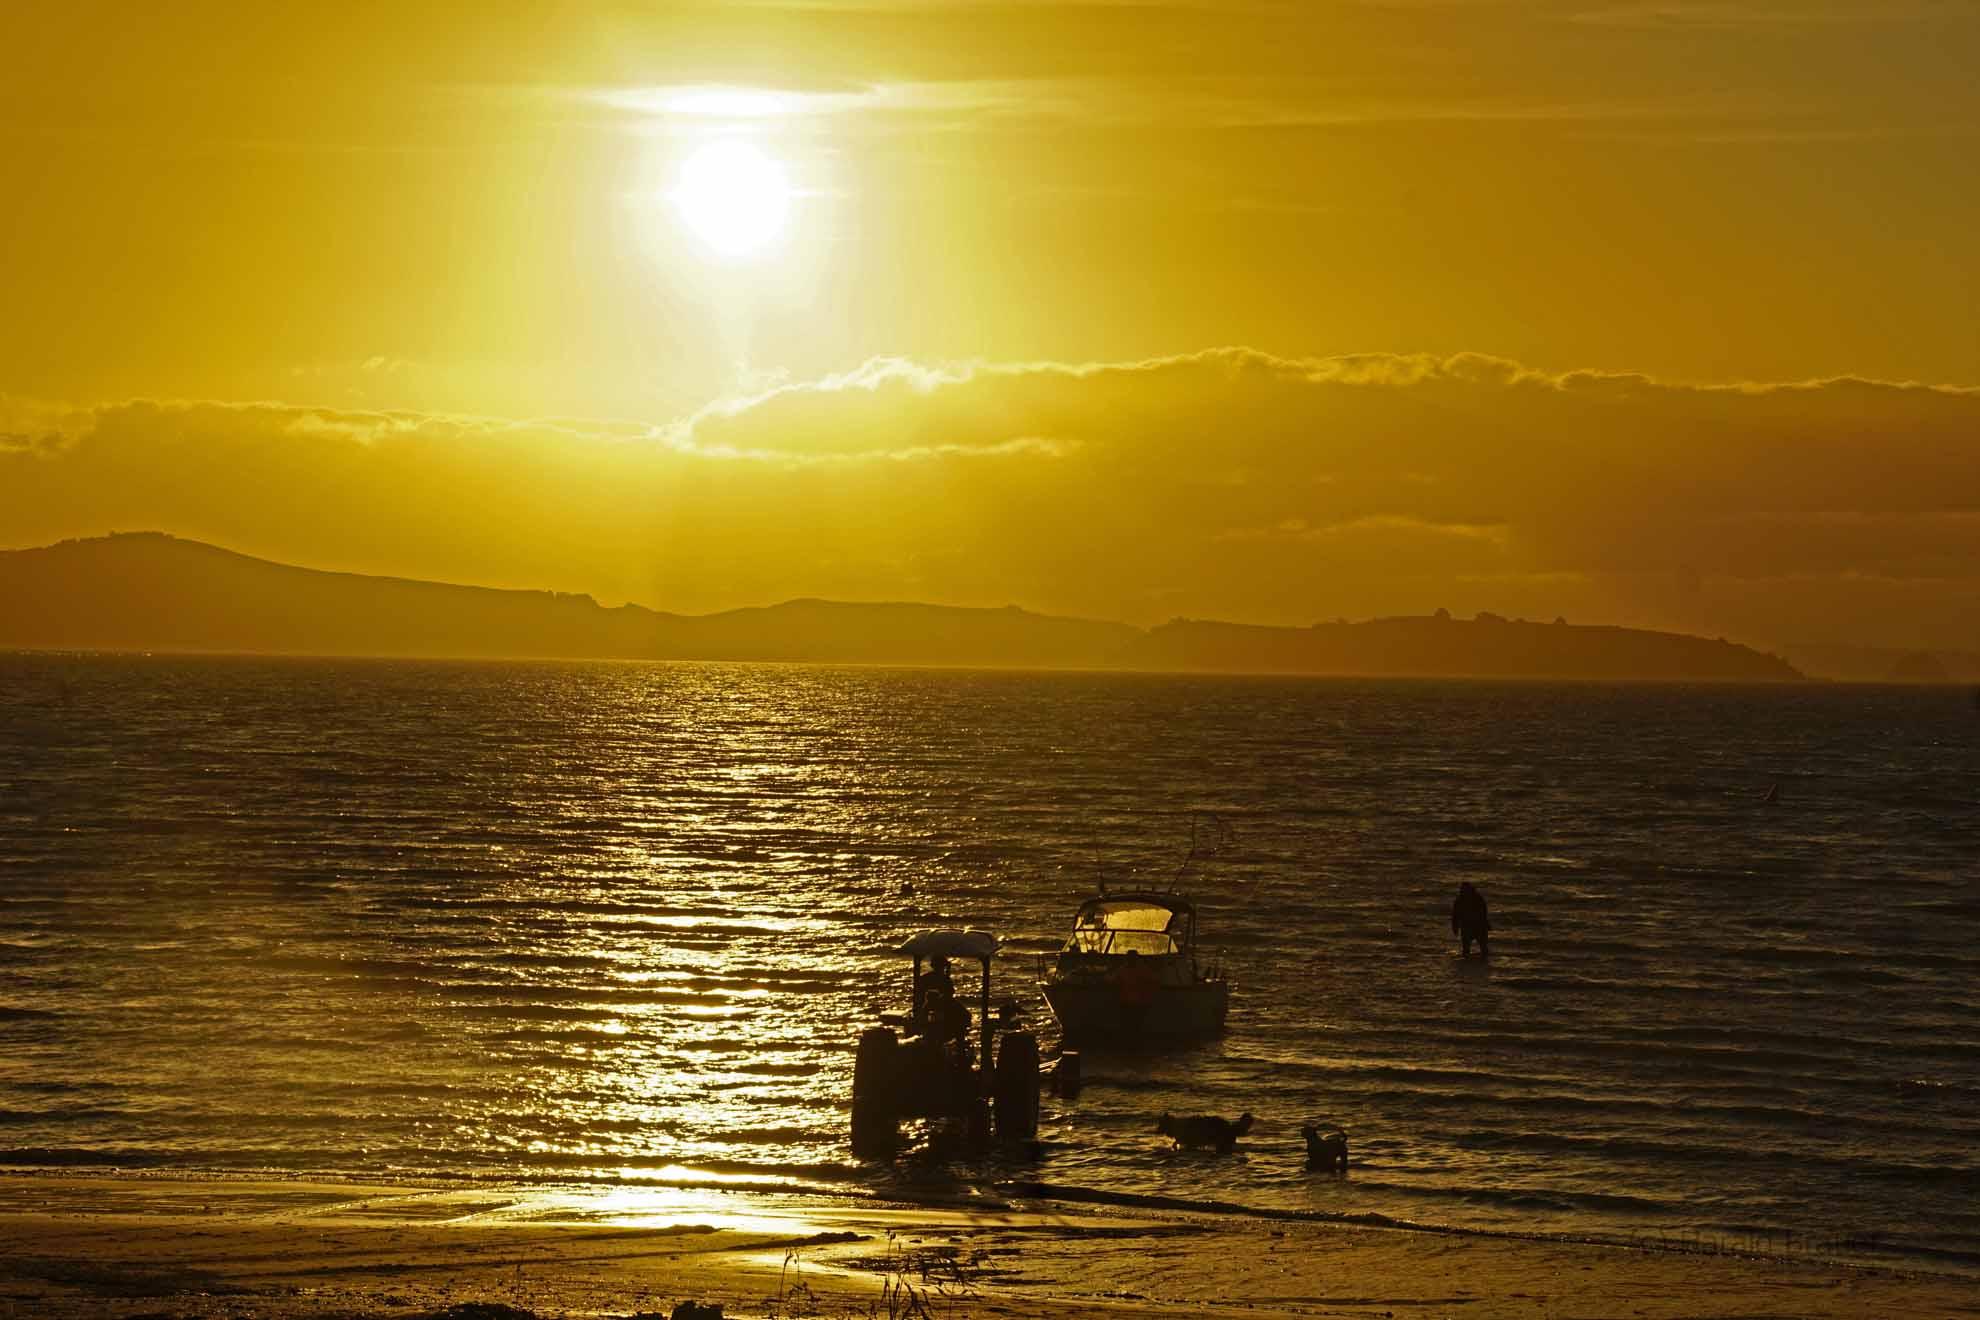 Long Bay Coromandel - Comming home from fishing